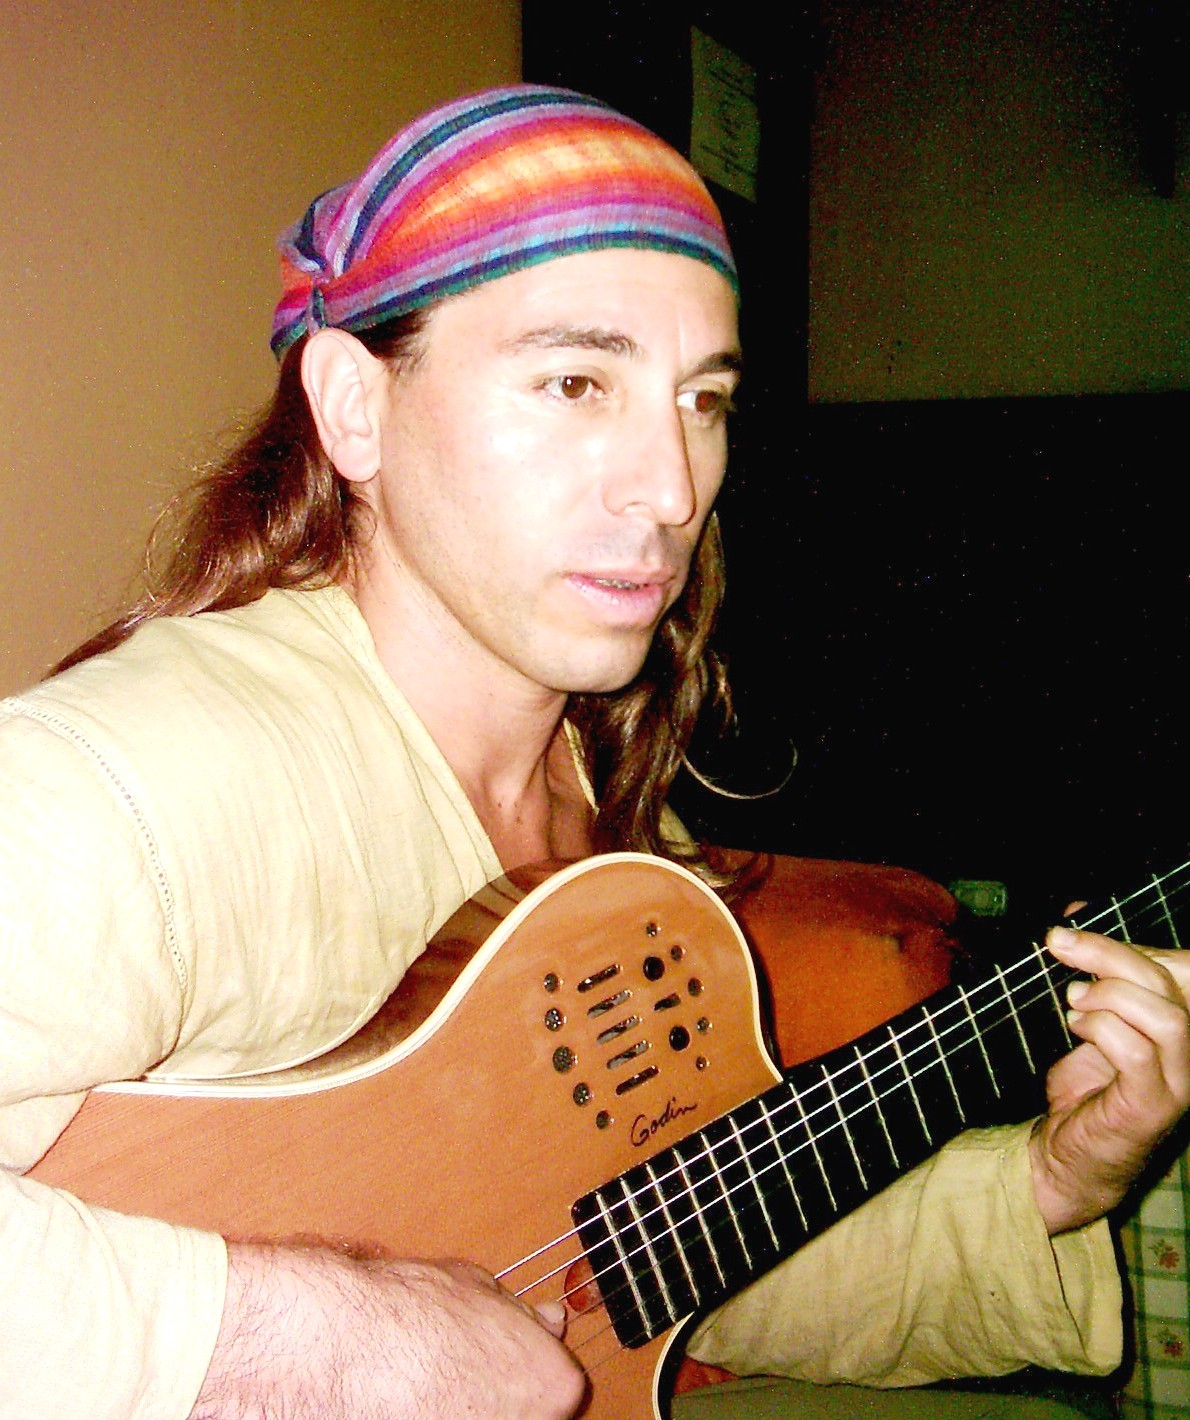 alex-piedra-cantautor-costarricense